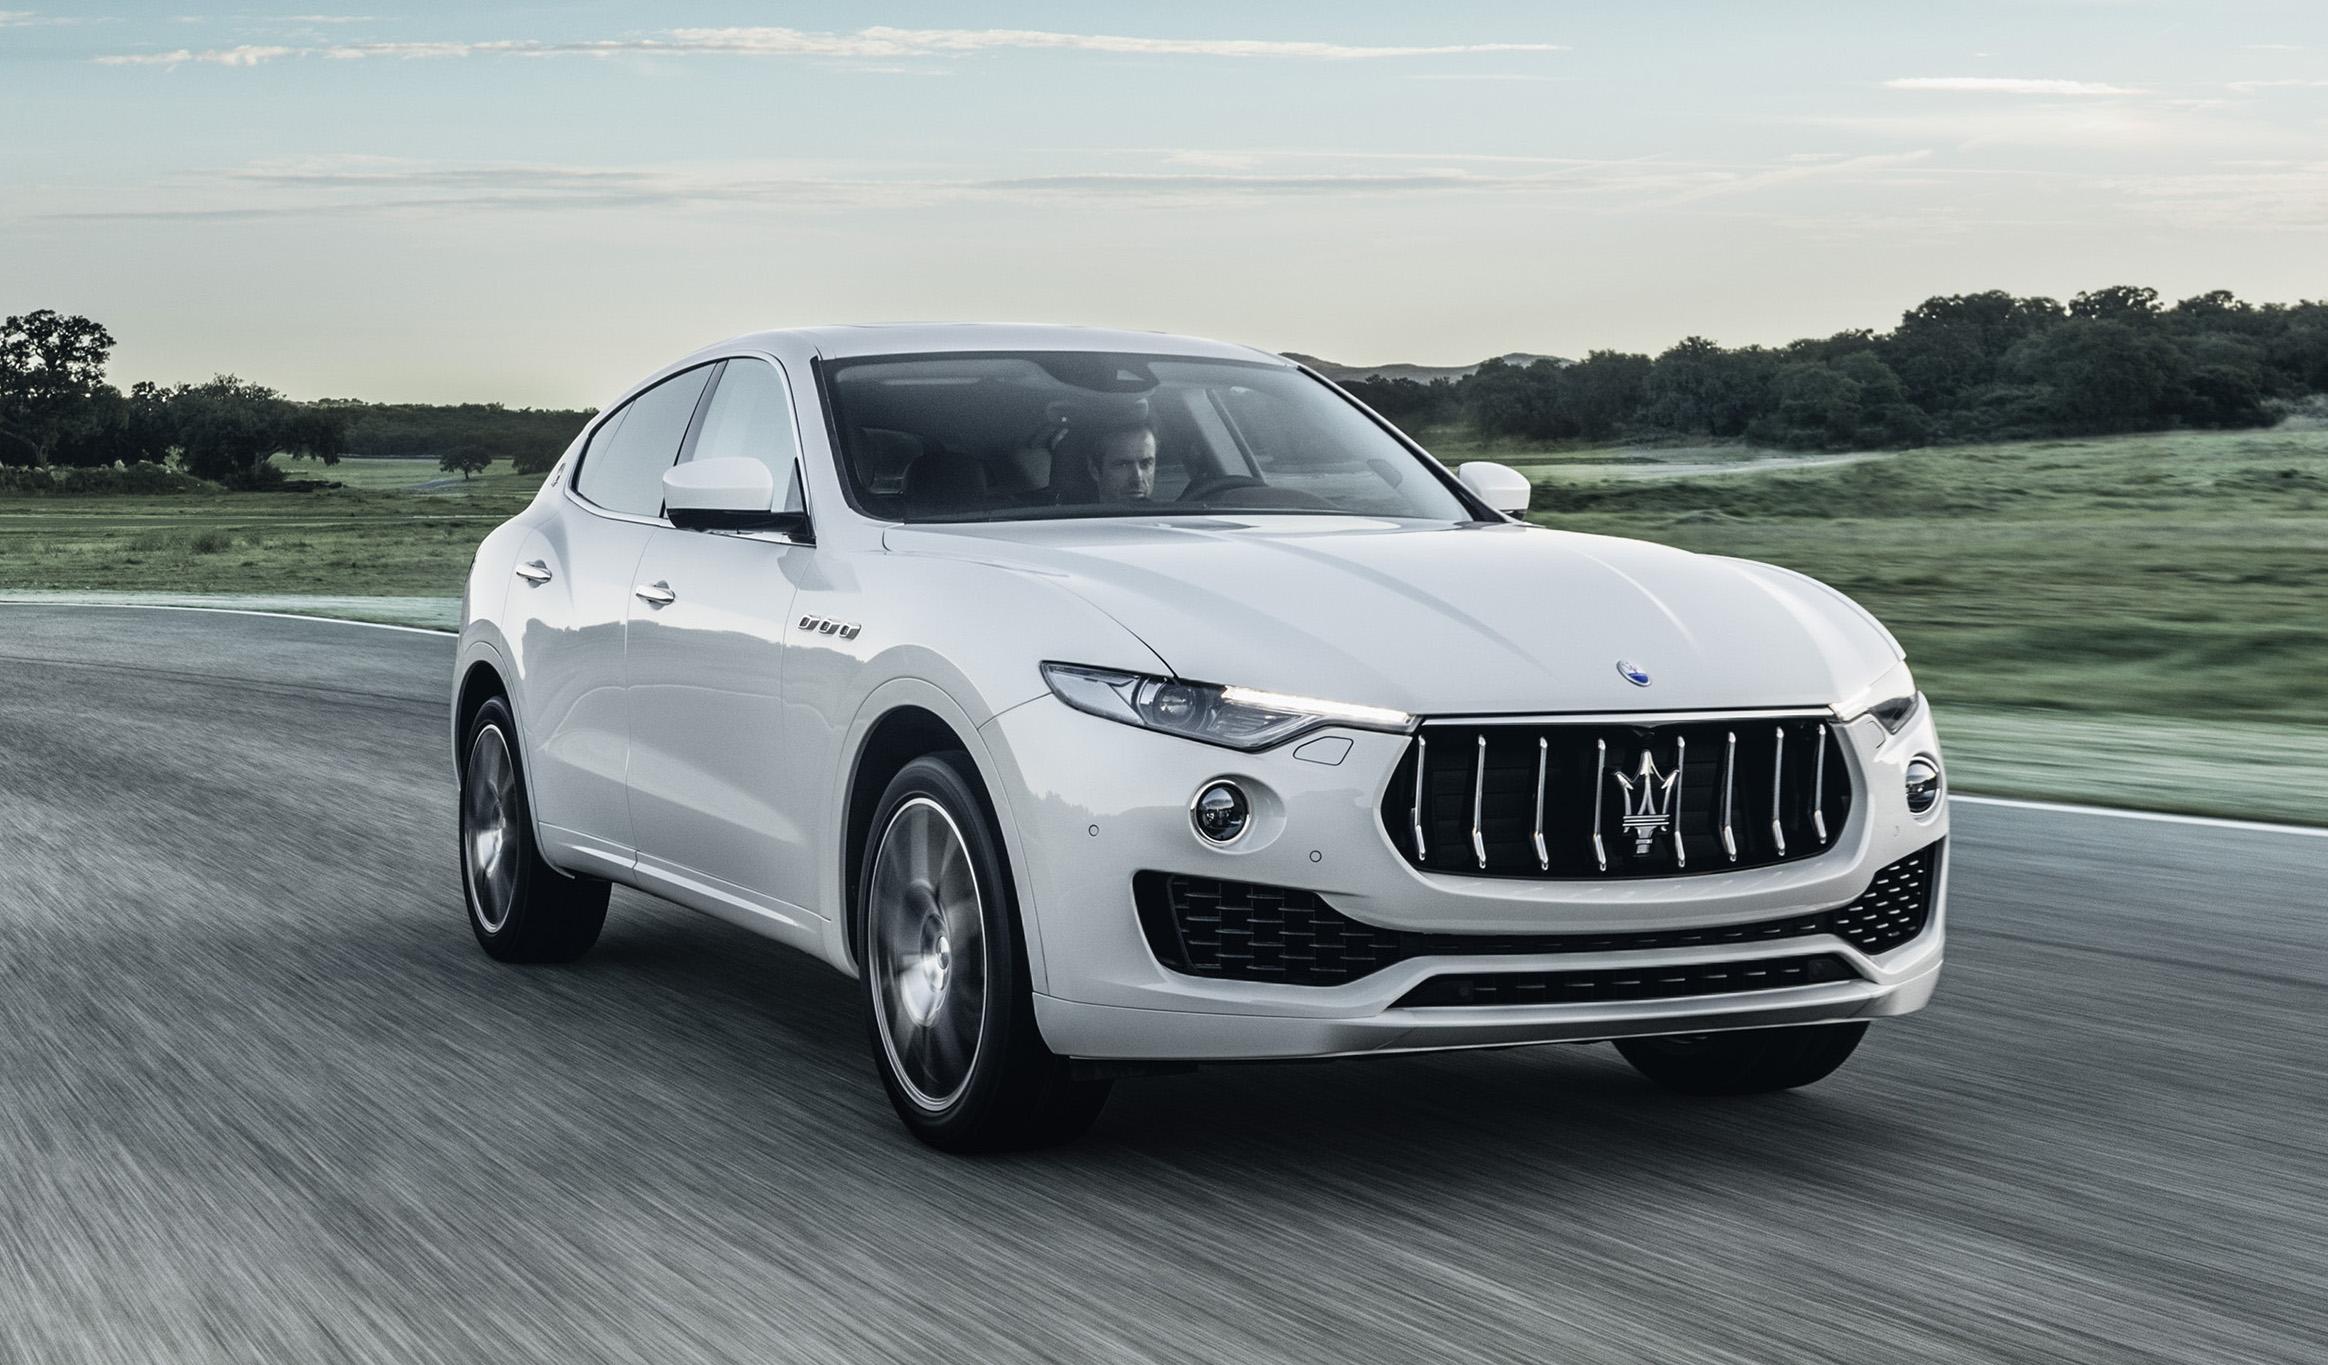 A white Maserati Levante, a midsize luxury SUV, on a country road.